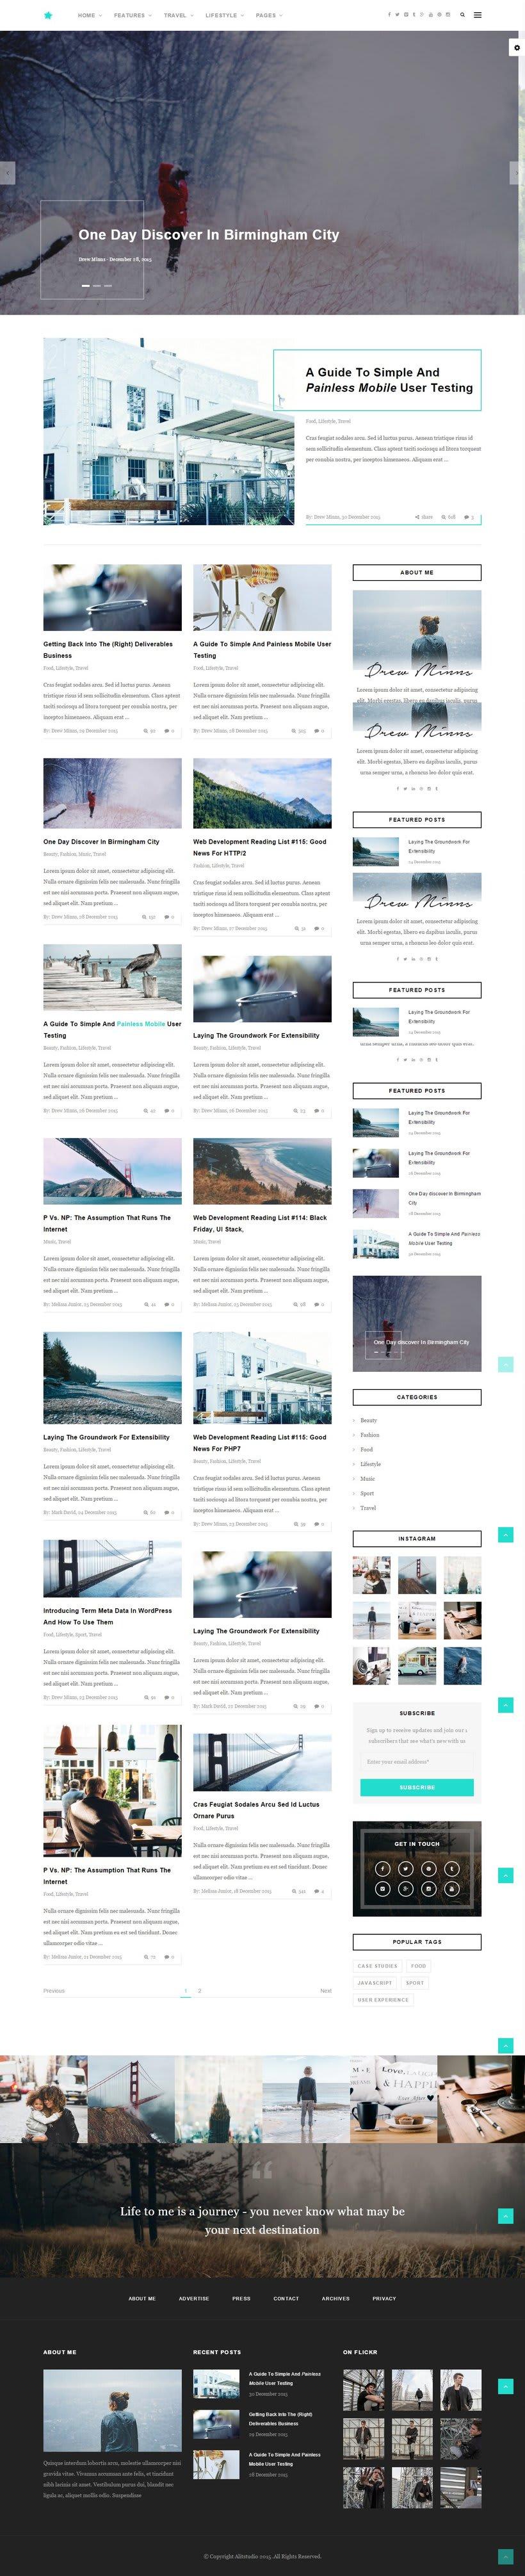 Plantilla WordPress para Blogs -1